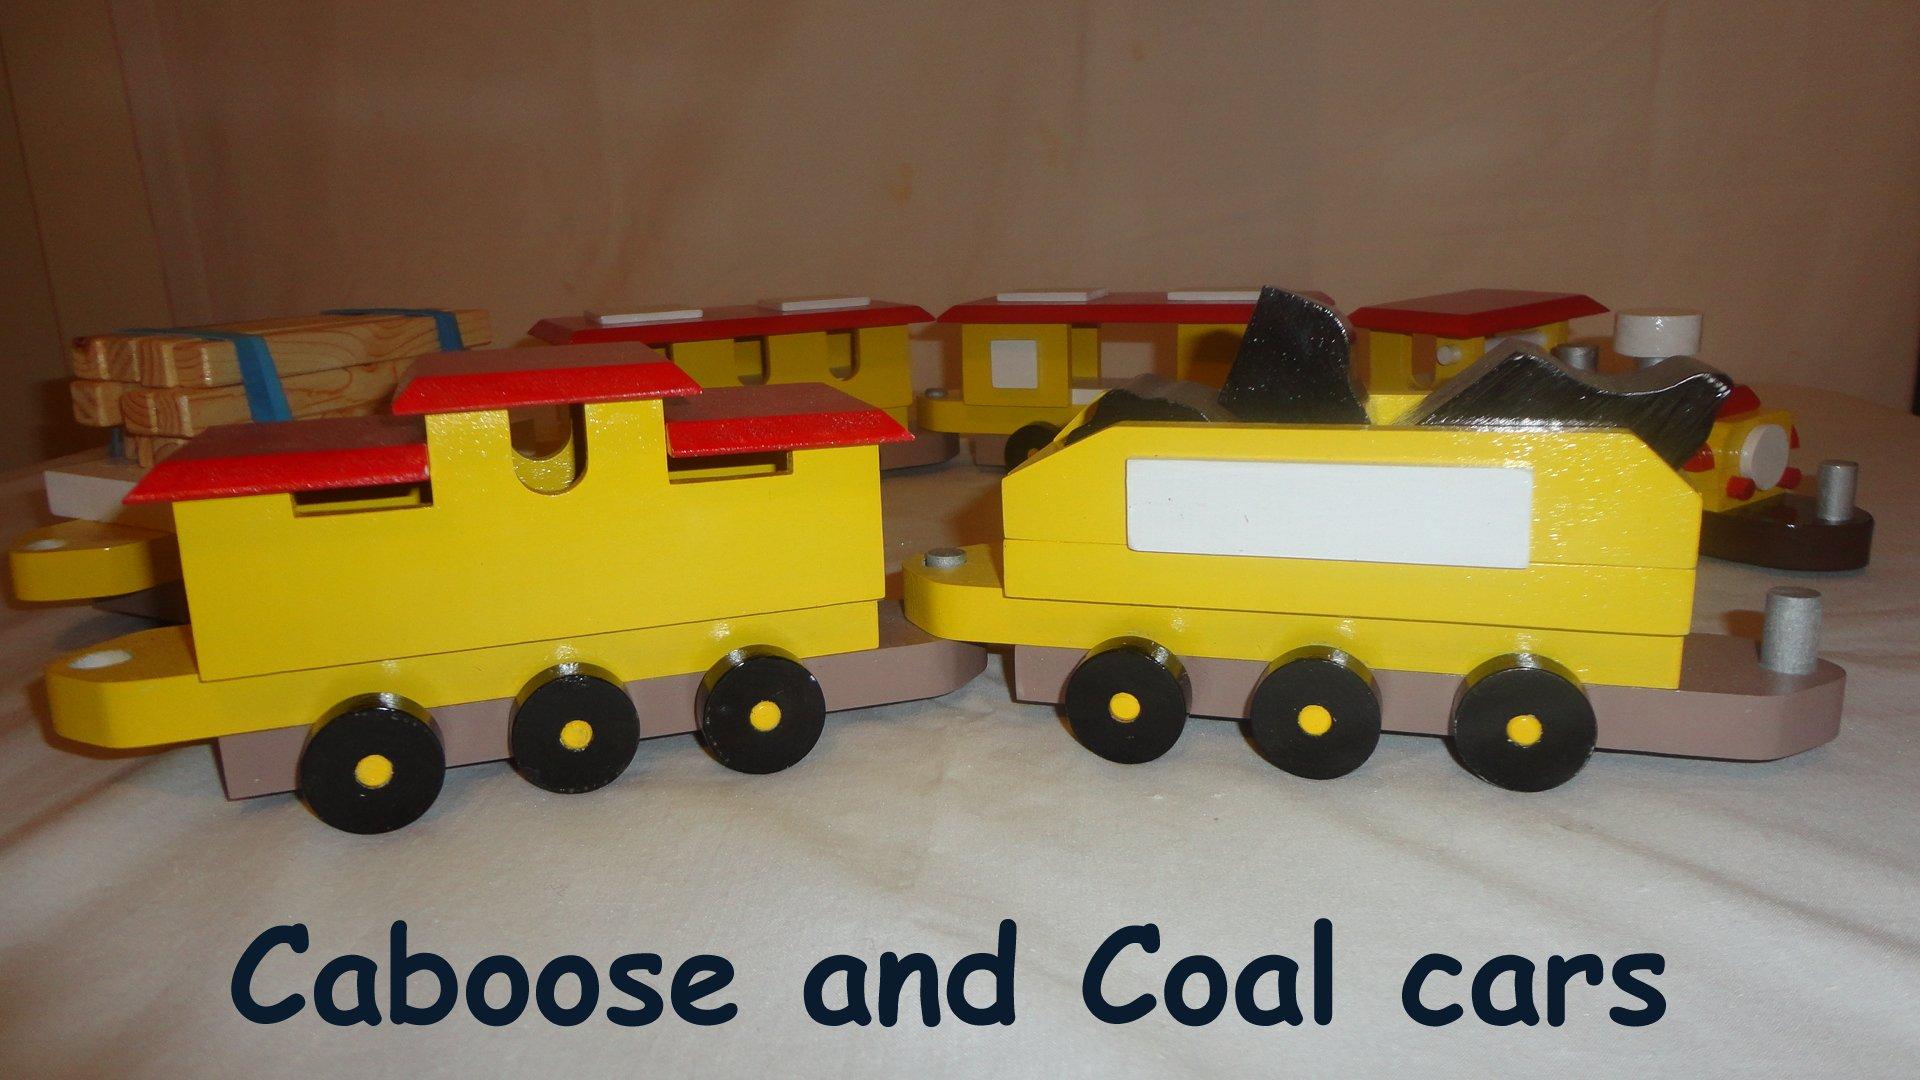 Caboose and coal-a.jpg